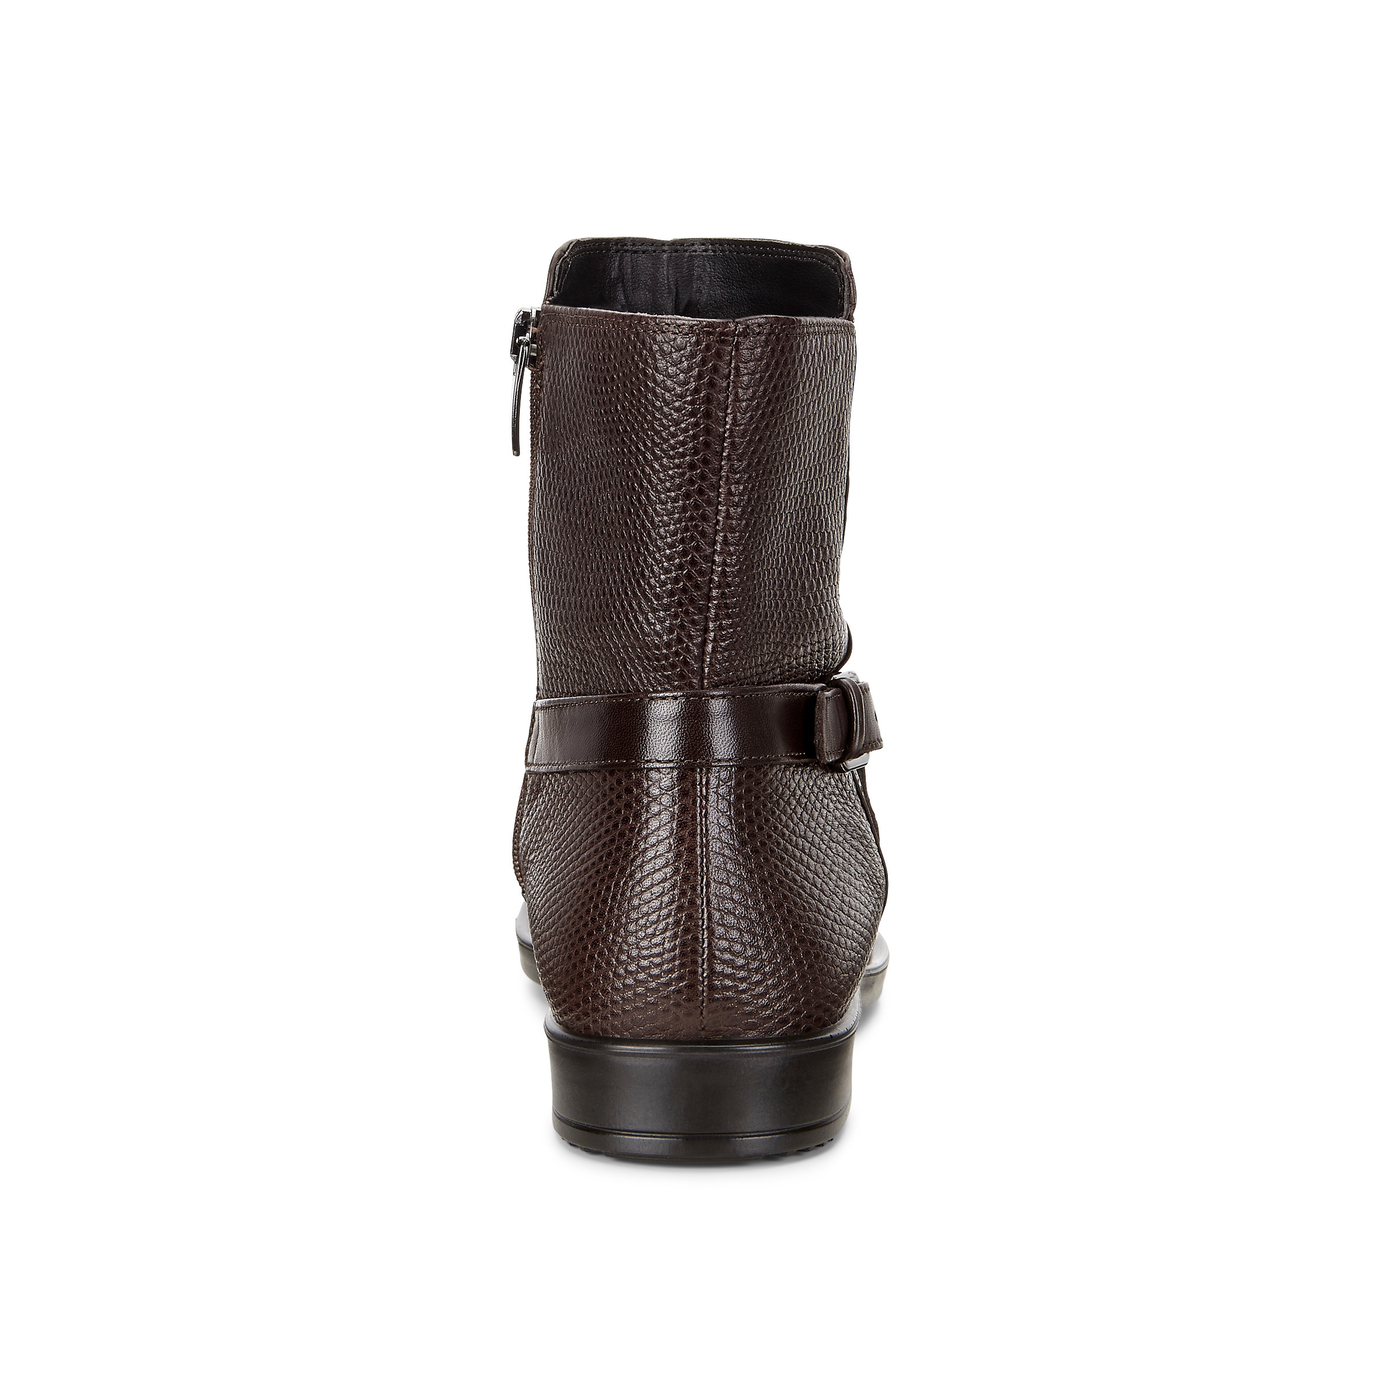 ECCO SHAPE M 15 Mid-cut Boot